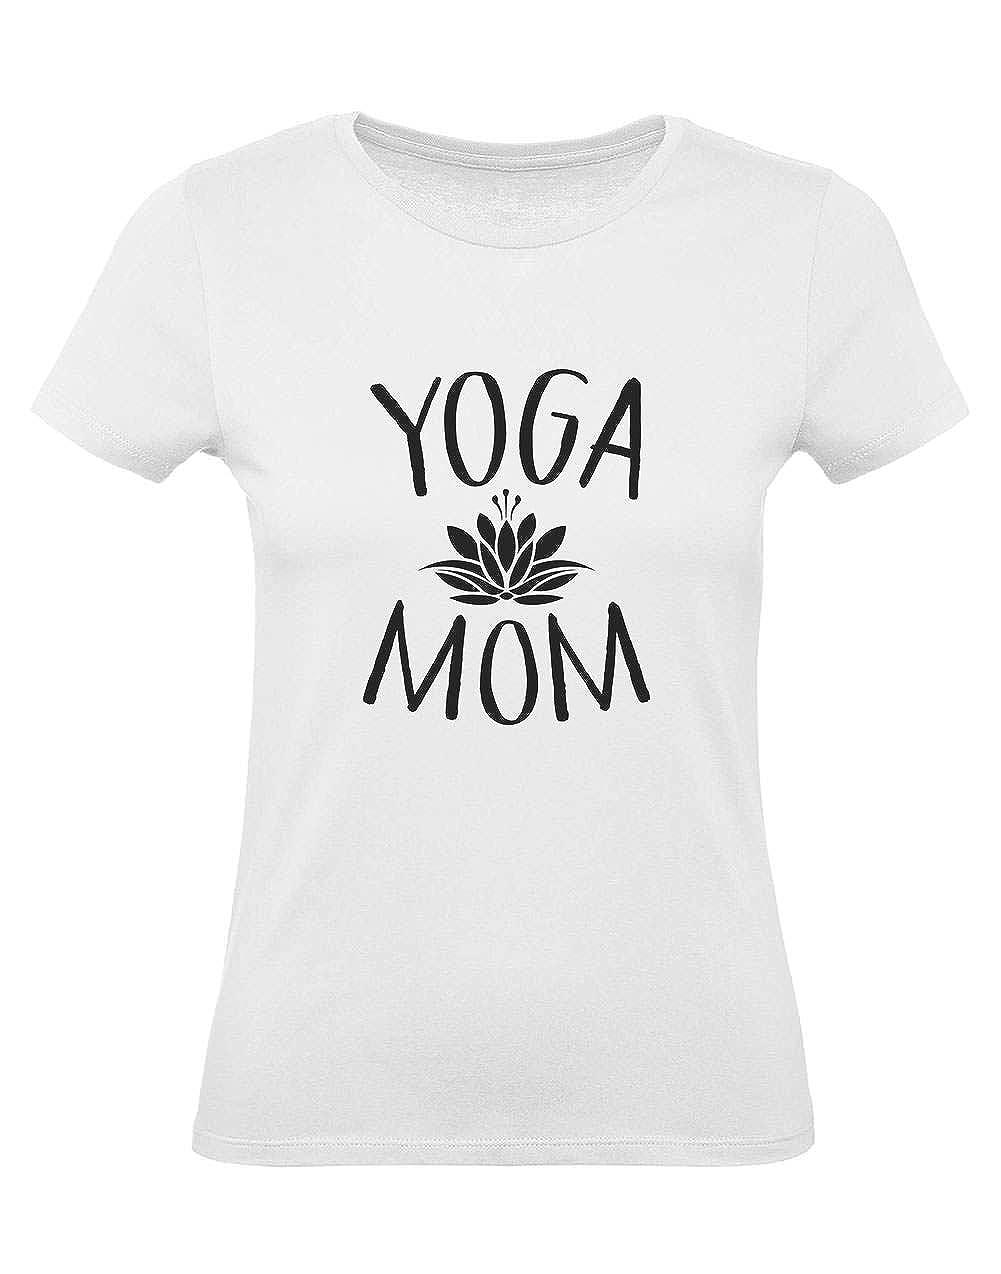 Green Turtle Camiseta para Mujer - Yoga Mom - Idea Regalo ...